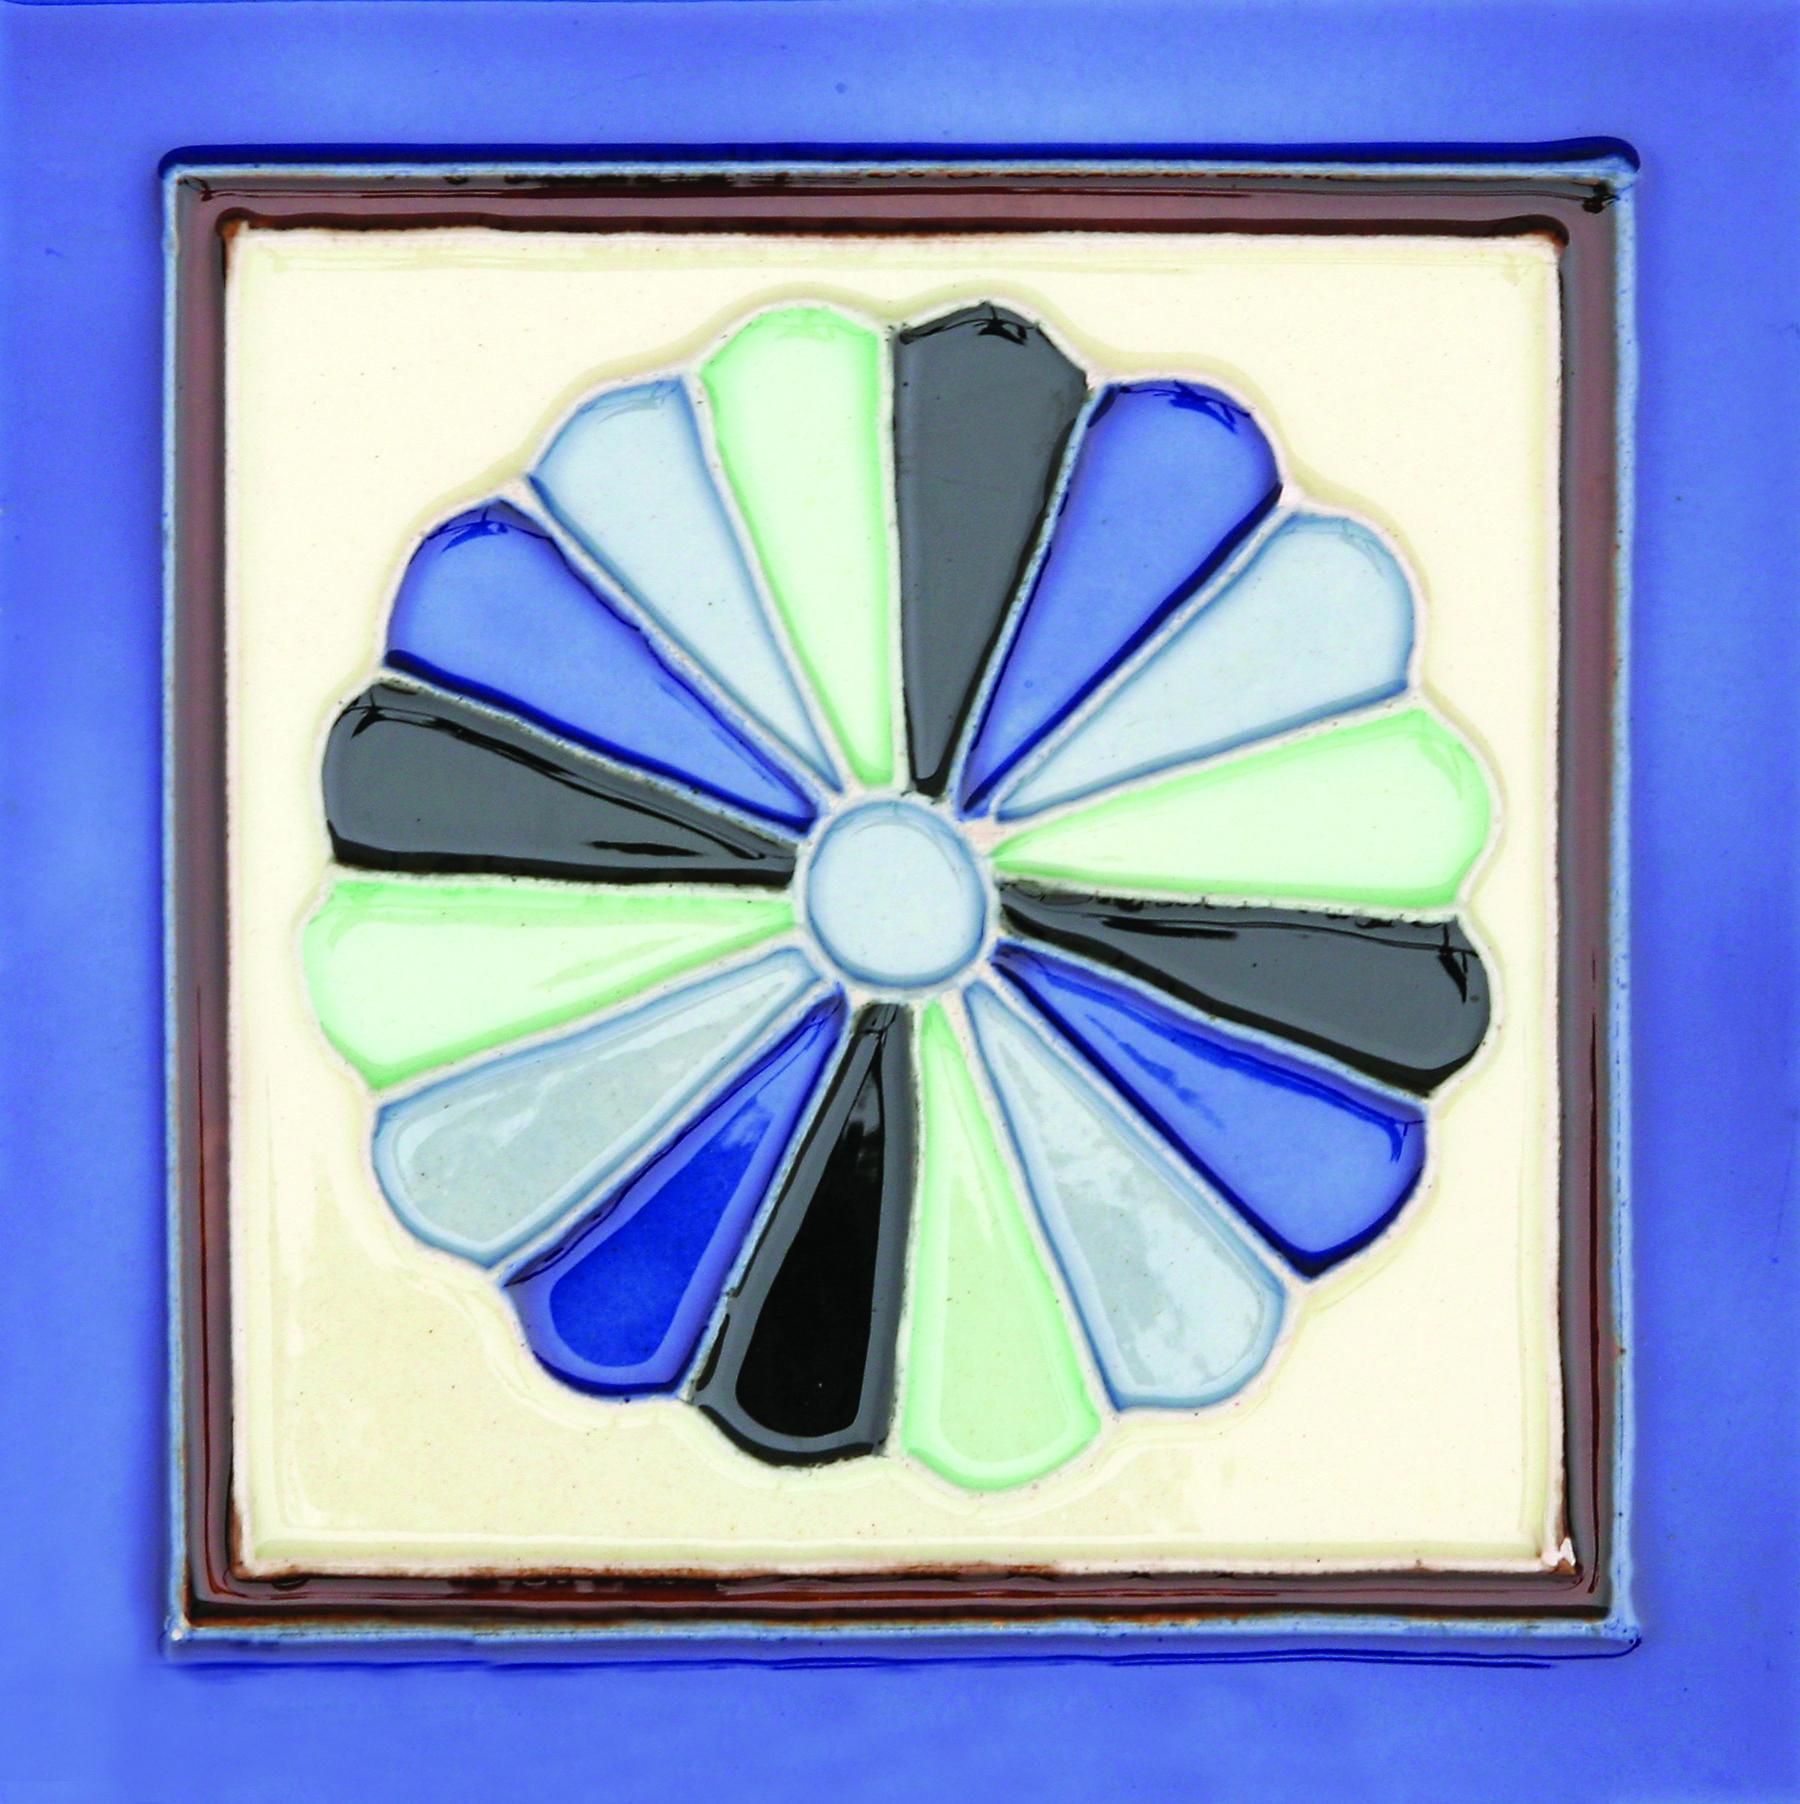 Glazed Hand-Painted Ceramic Glazed Wall Tile in Abanico 0